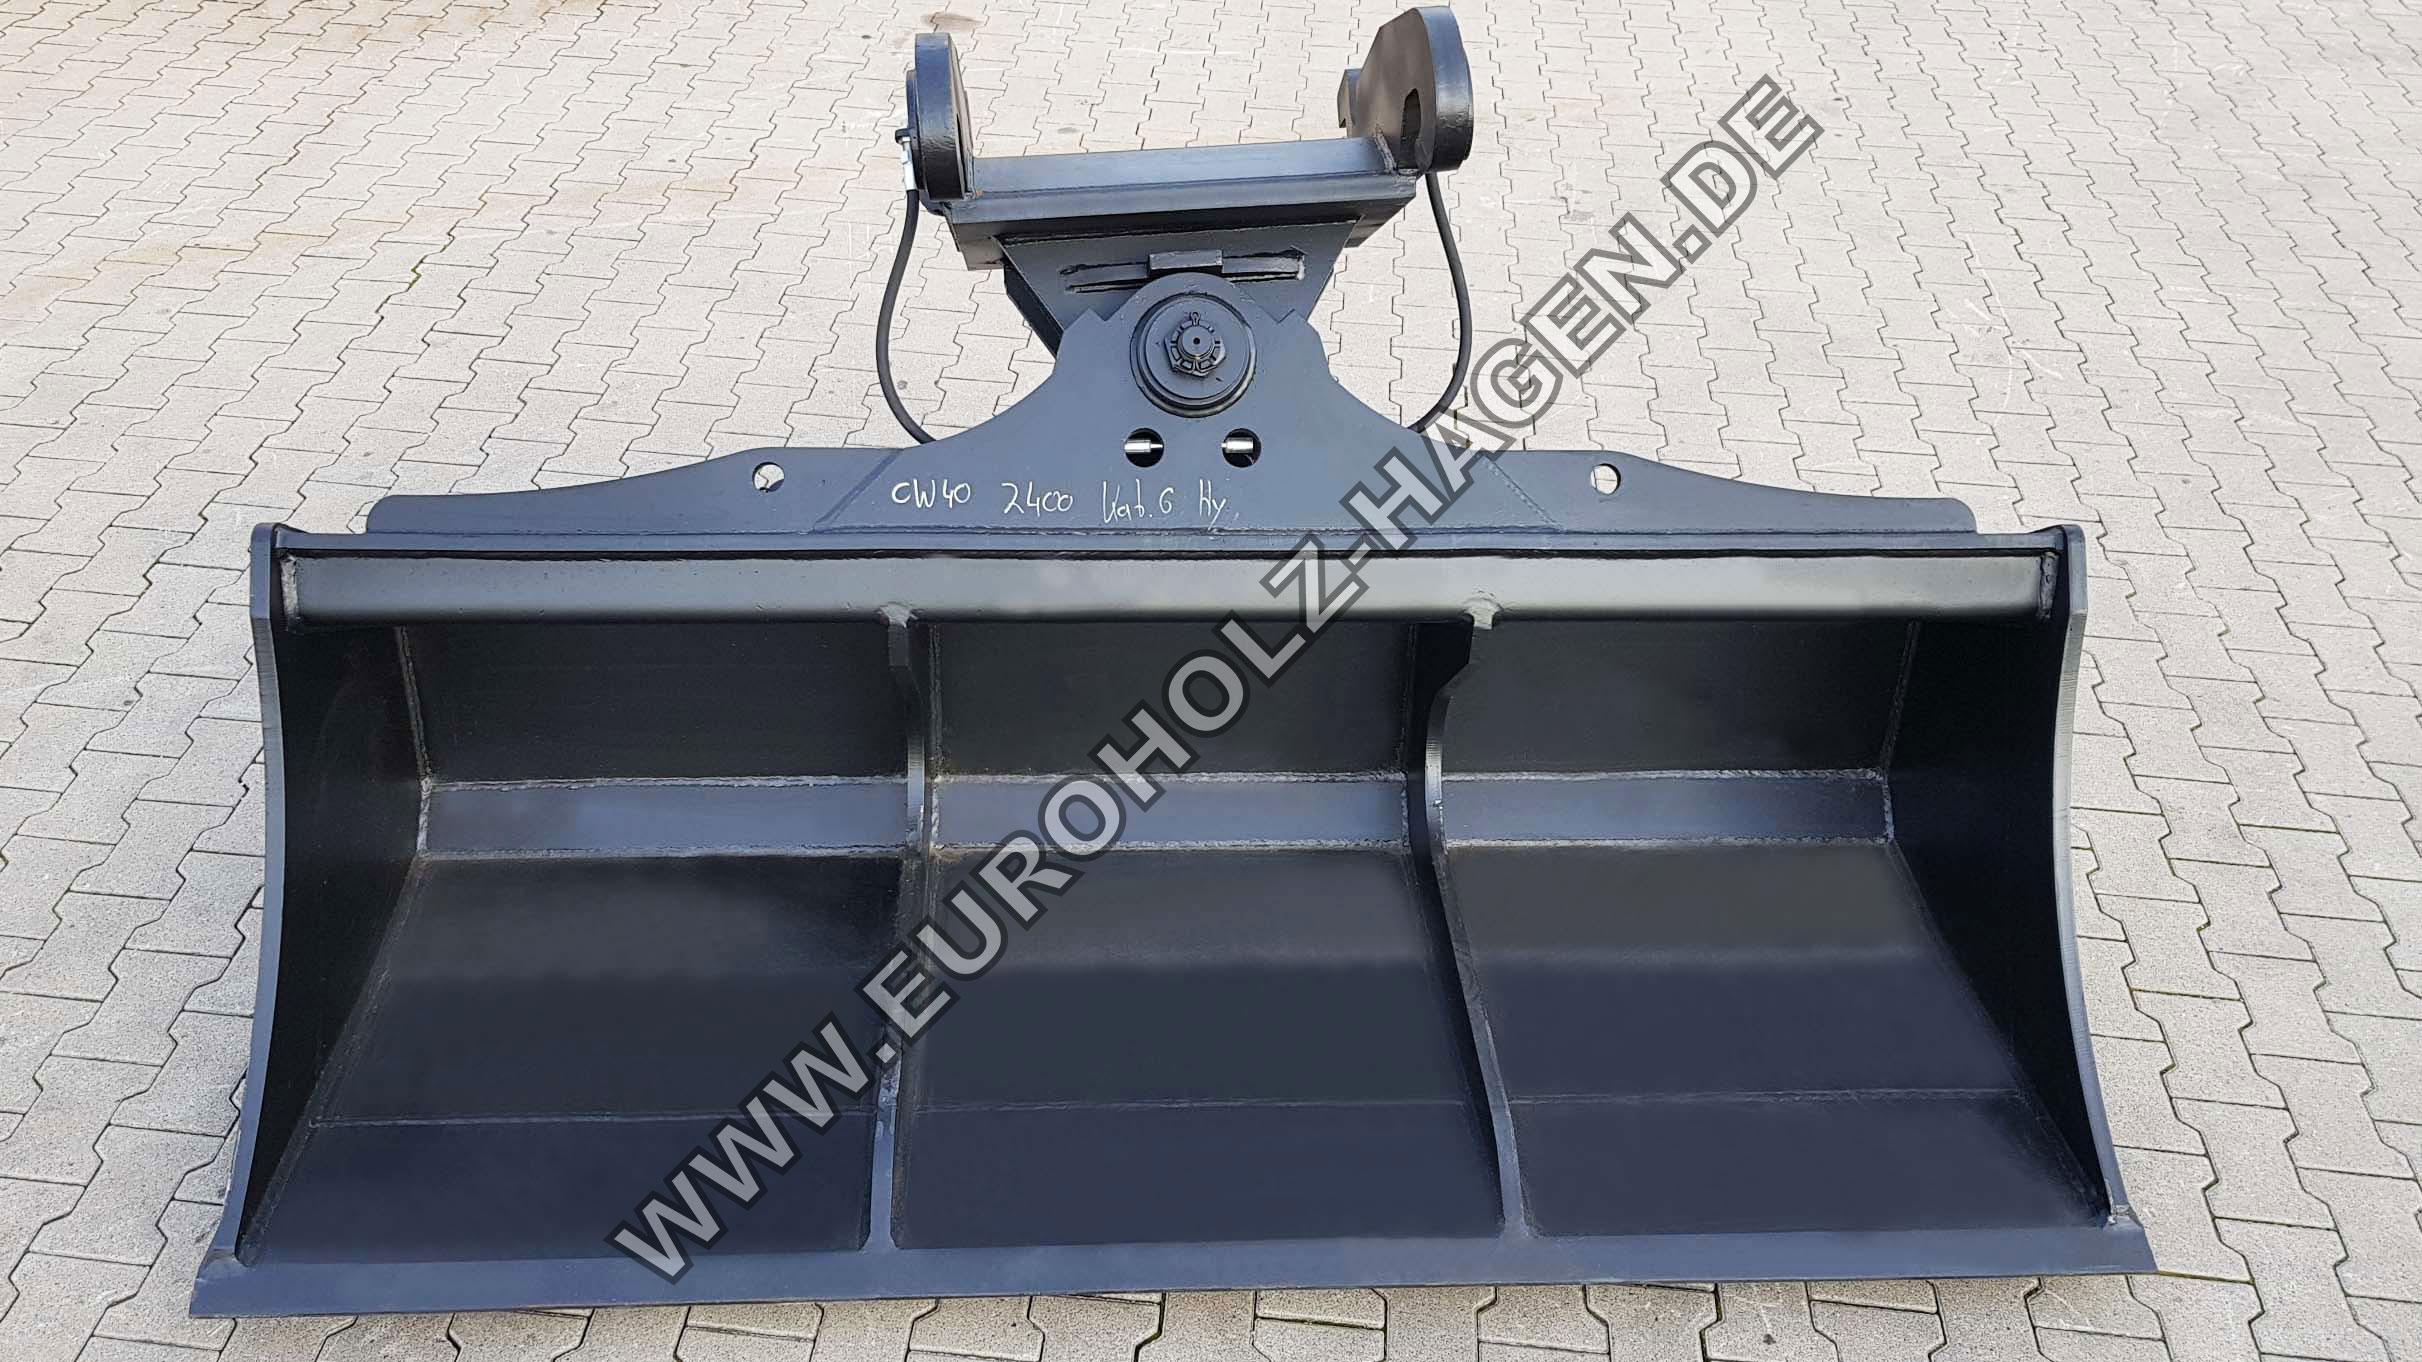 Grabenräumlöffel CW40 2400 mm schwenkbar Verachtert CW eh EH Euroholz